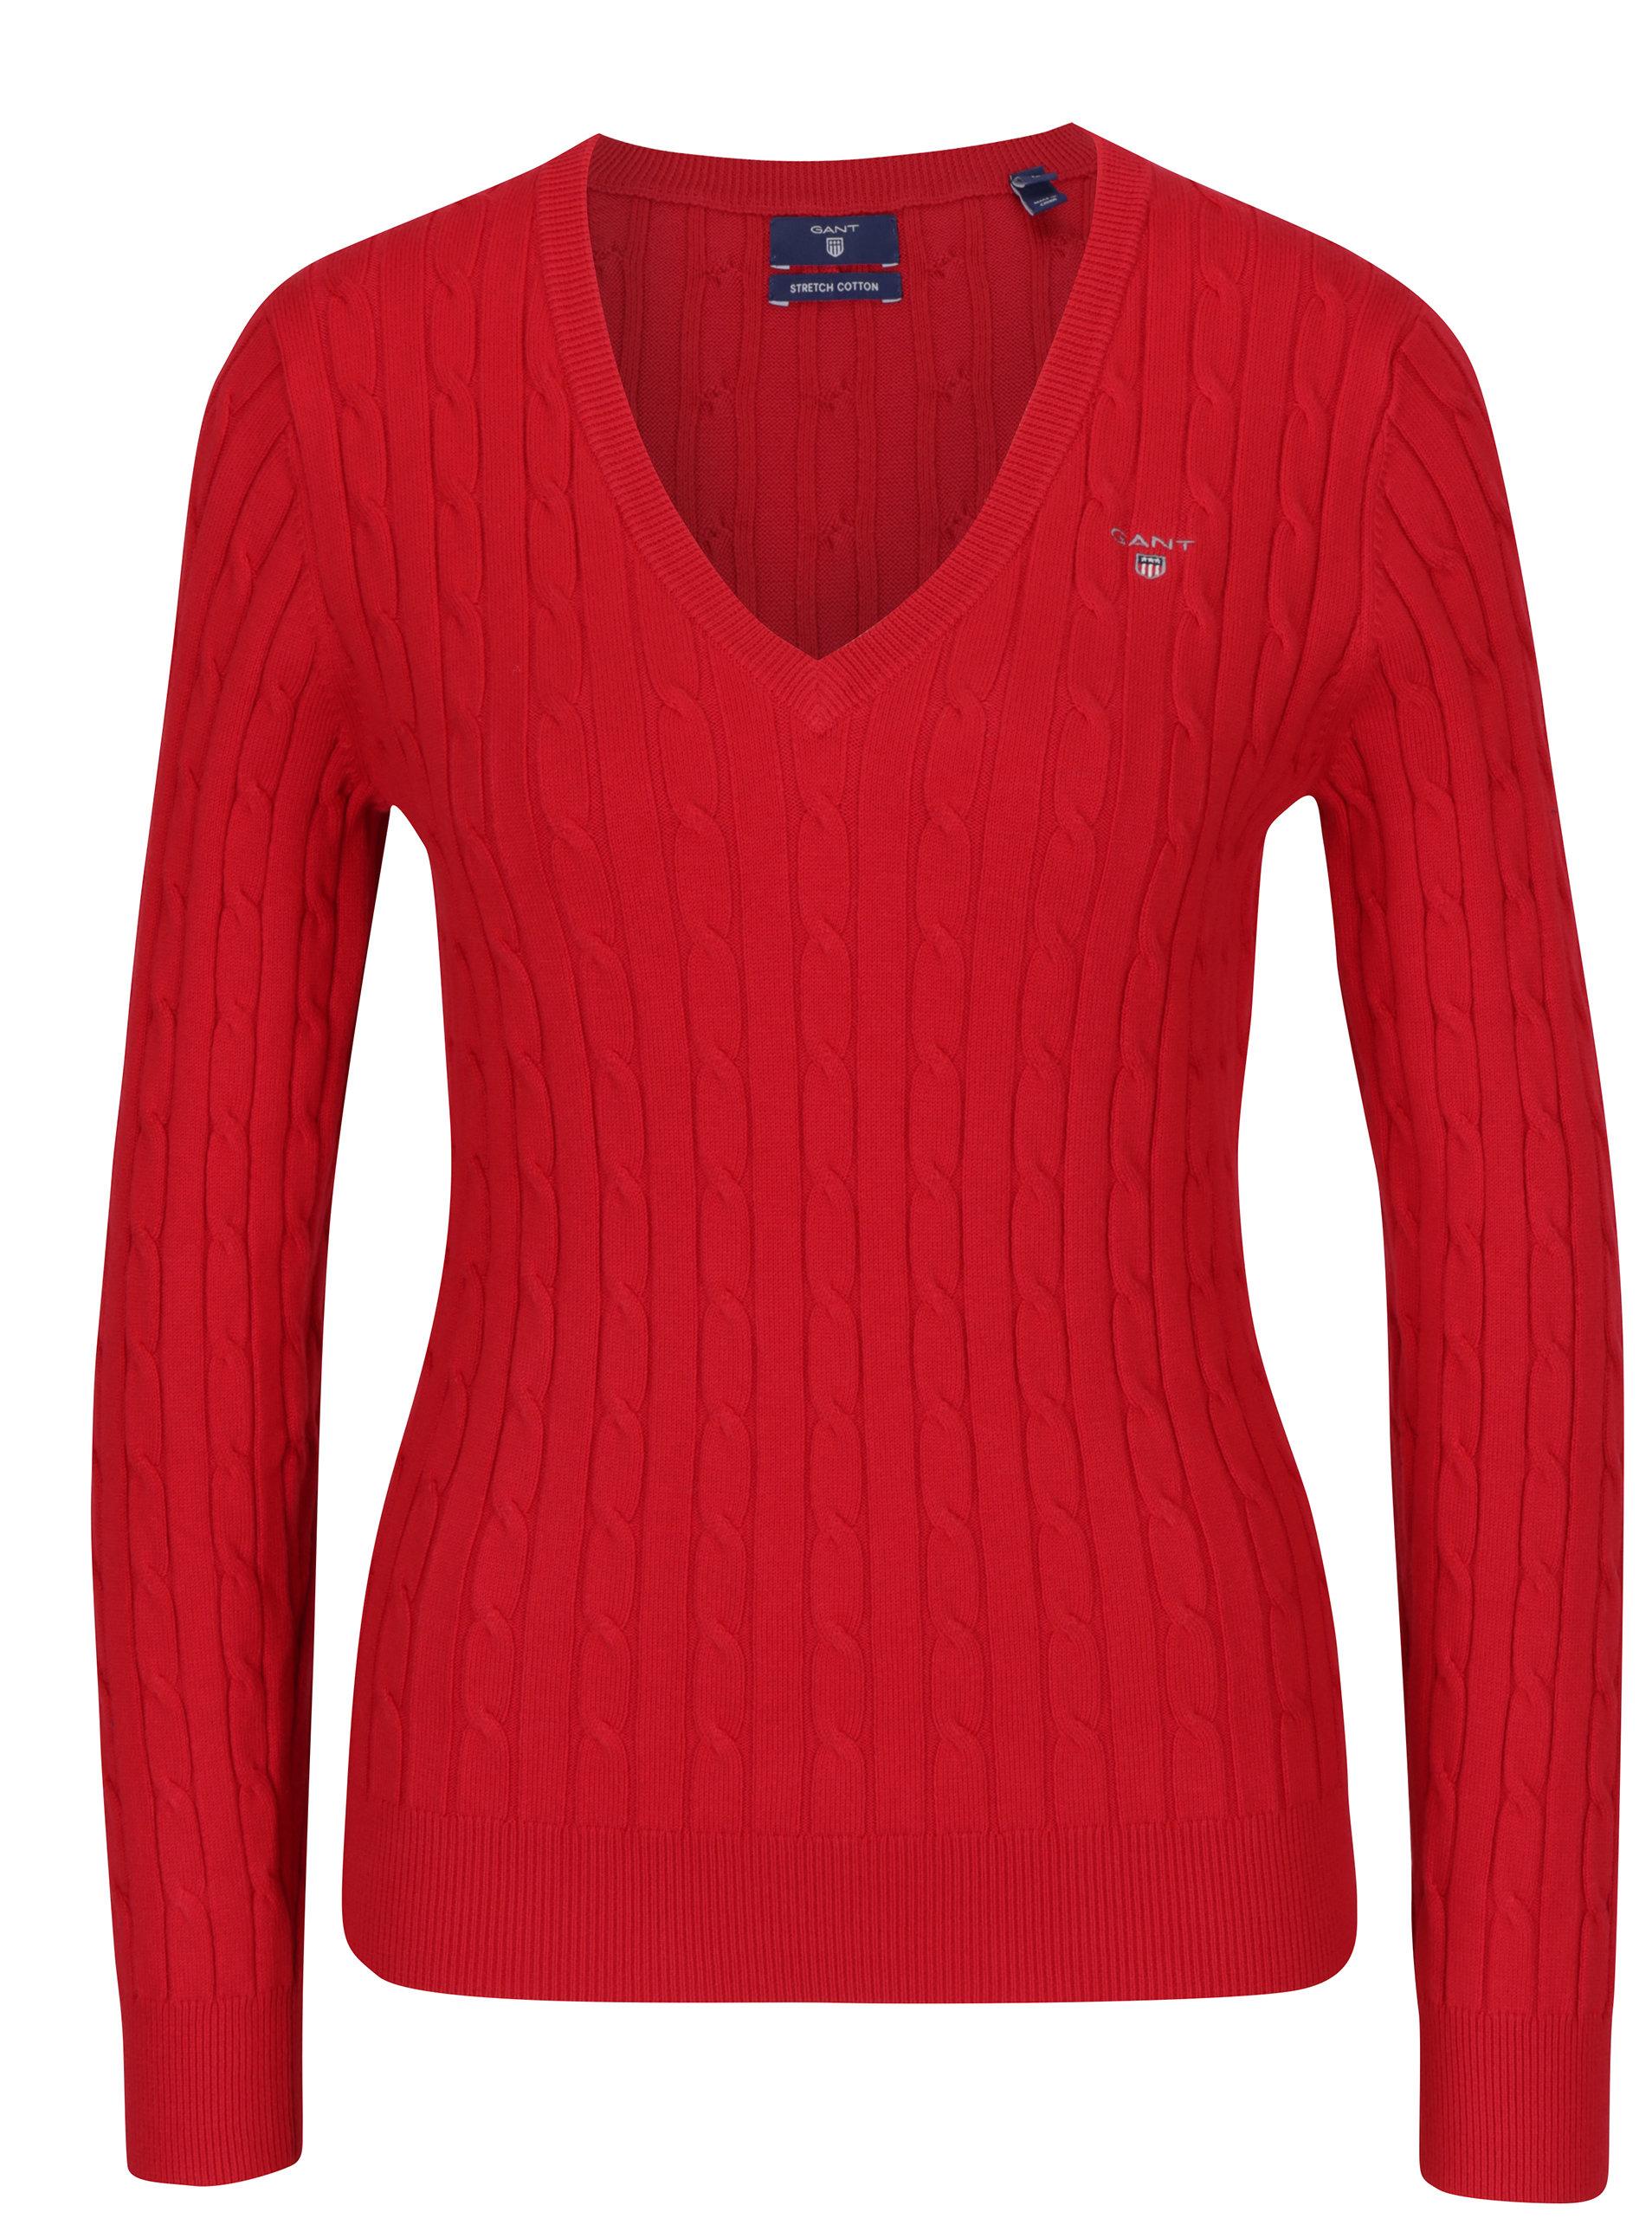 f3340d532f14 Červený dámsky sveter s véčkovým výstrihom GANT ...